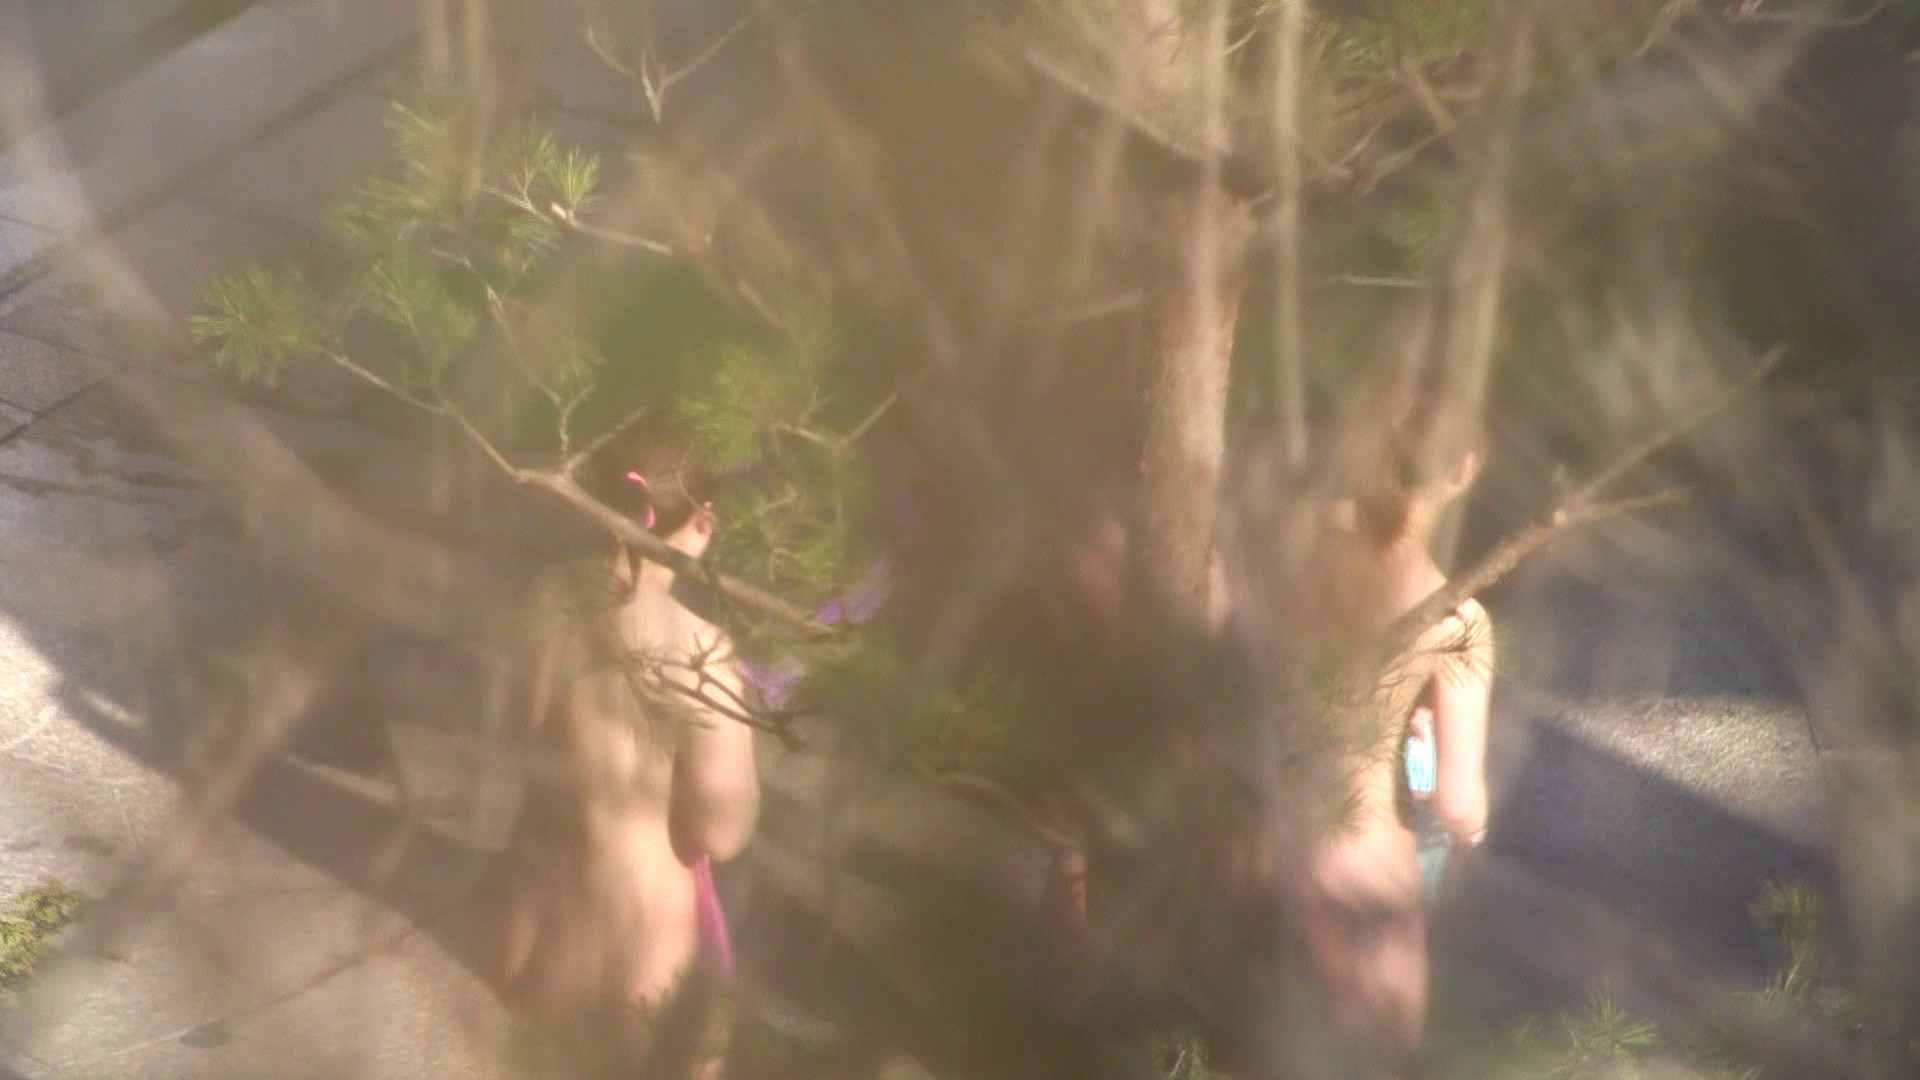 Aquaな露天風呂Vol.698 美しいOLの裸体 われめAV動画紹介 104pic 14